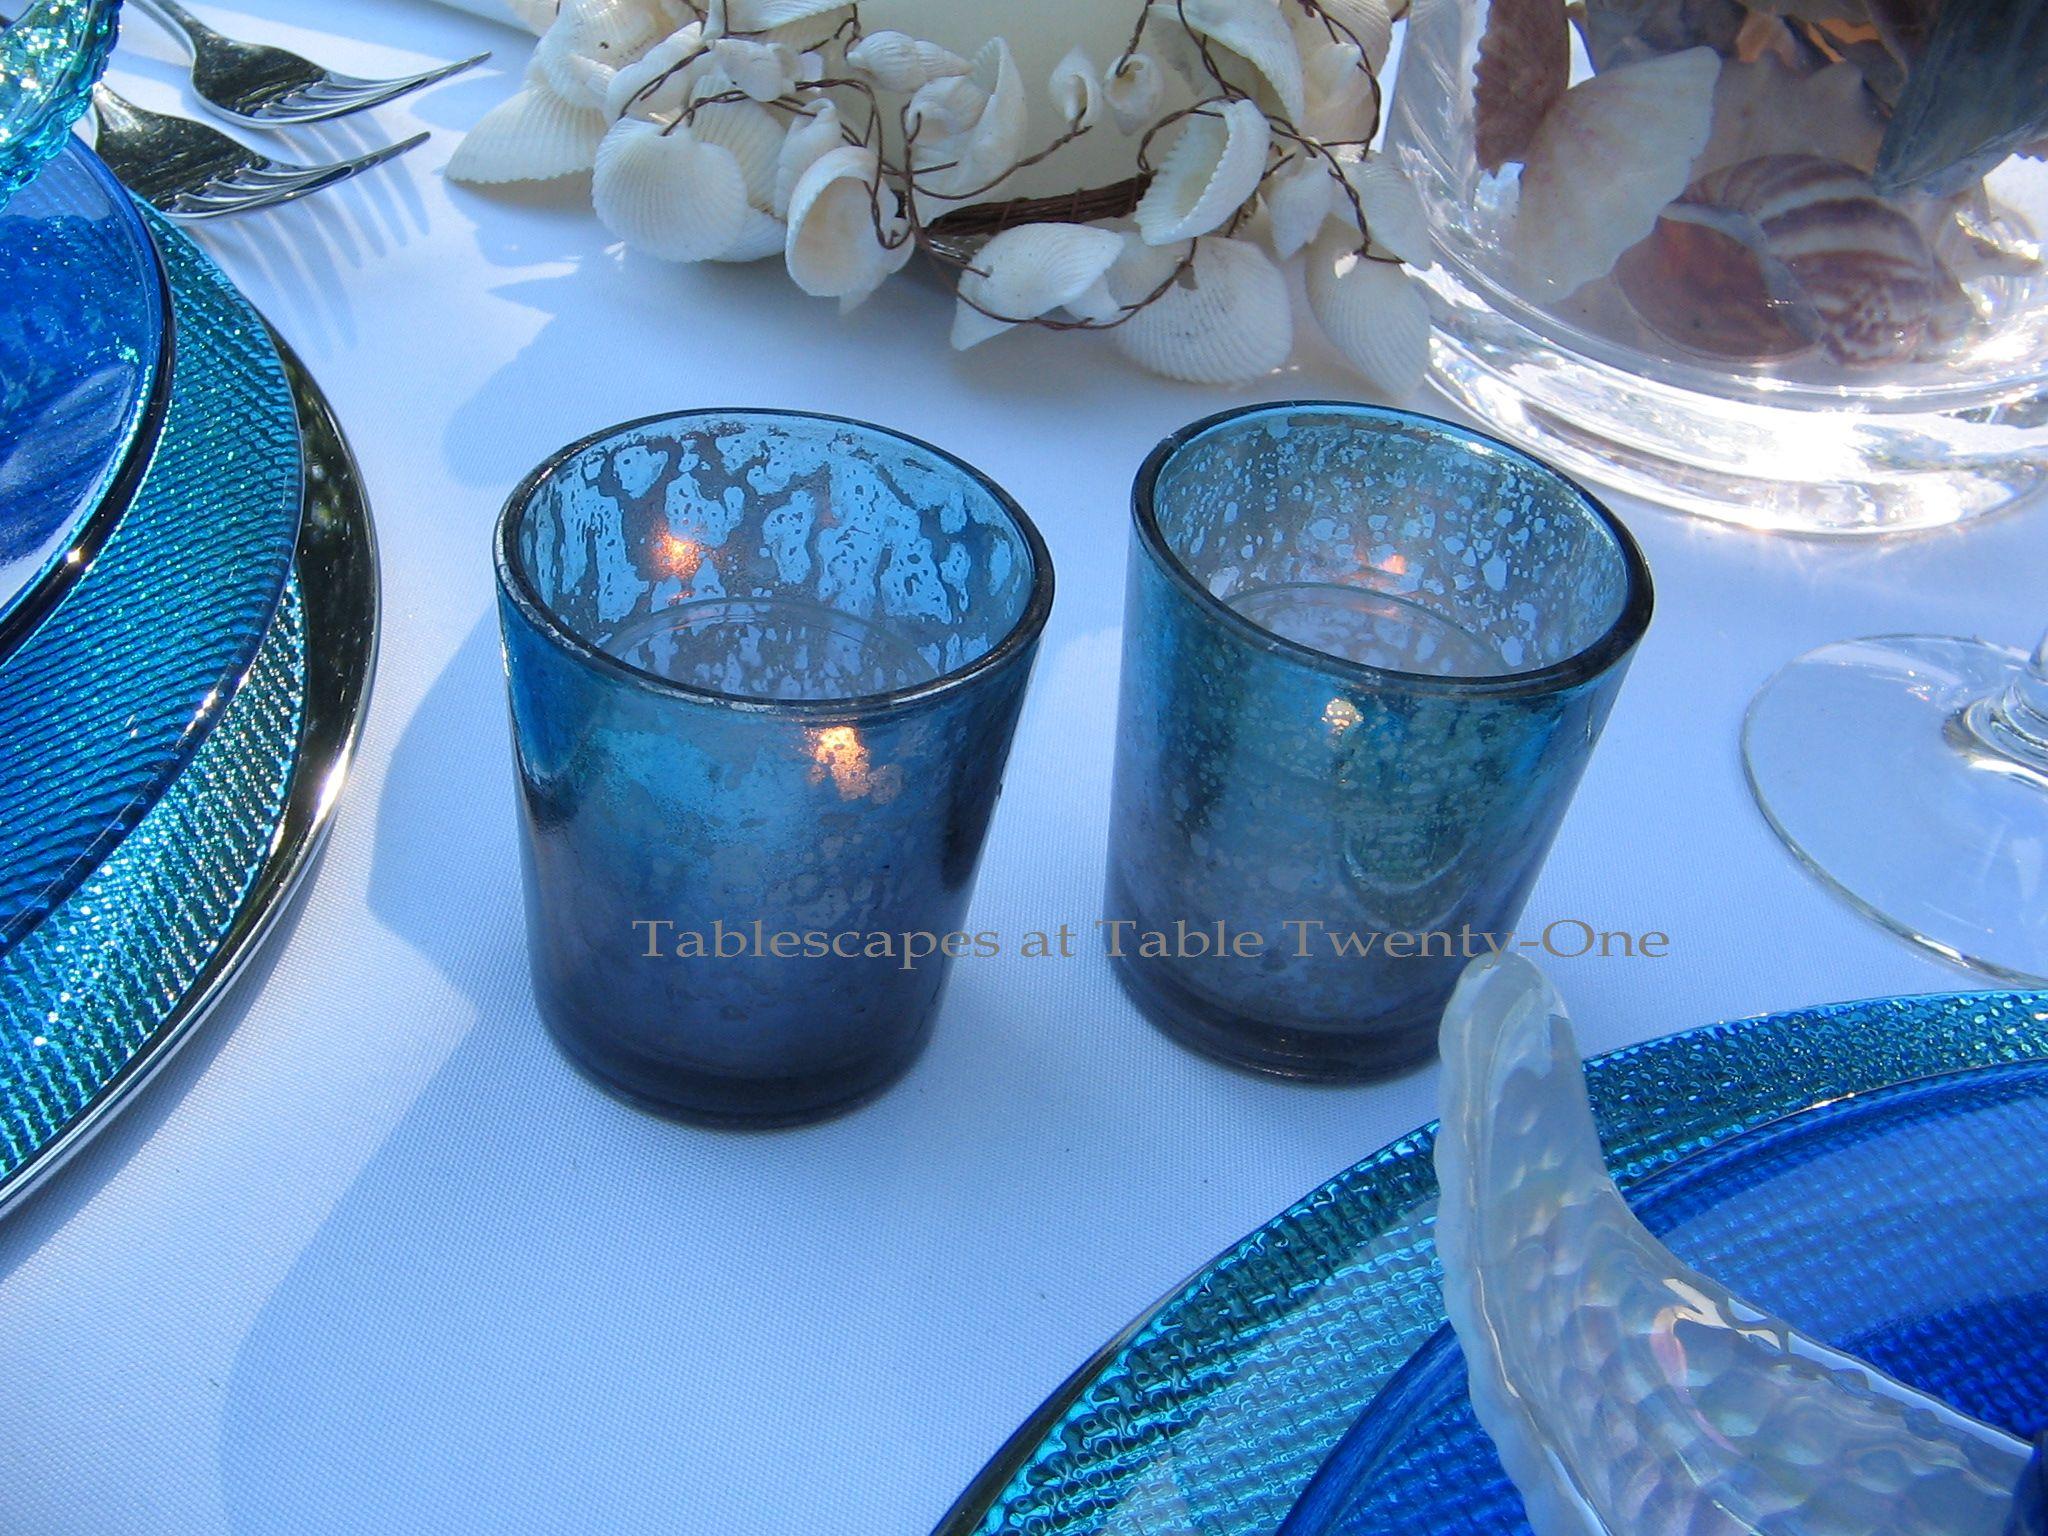 Tablescapes at Table Twenty-One, www.tabletwentyone.wordpress.com, Ocean Blue – Starfish & Seashells:  turquoise, cobalt blue  & silver mercury glass votive holders